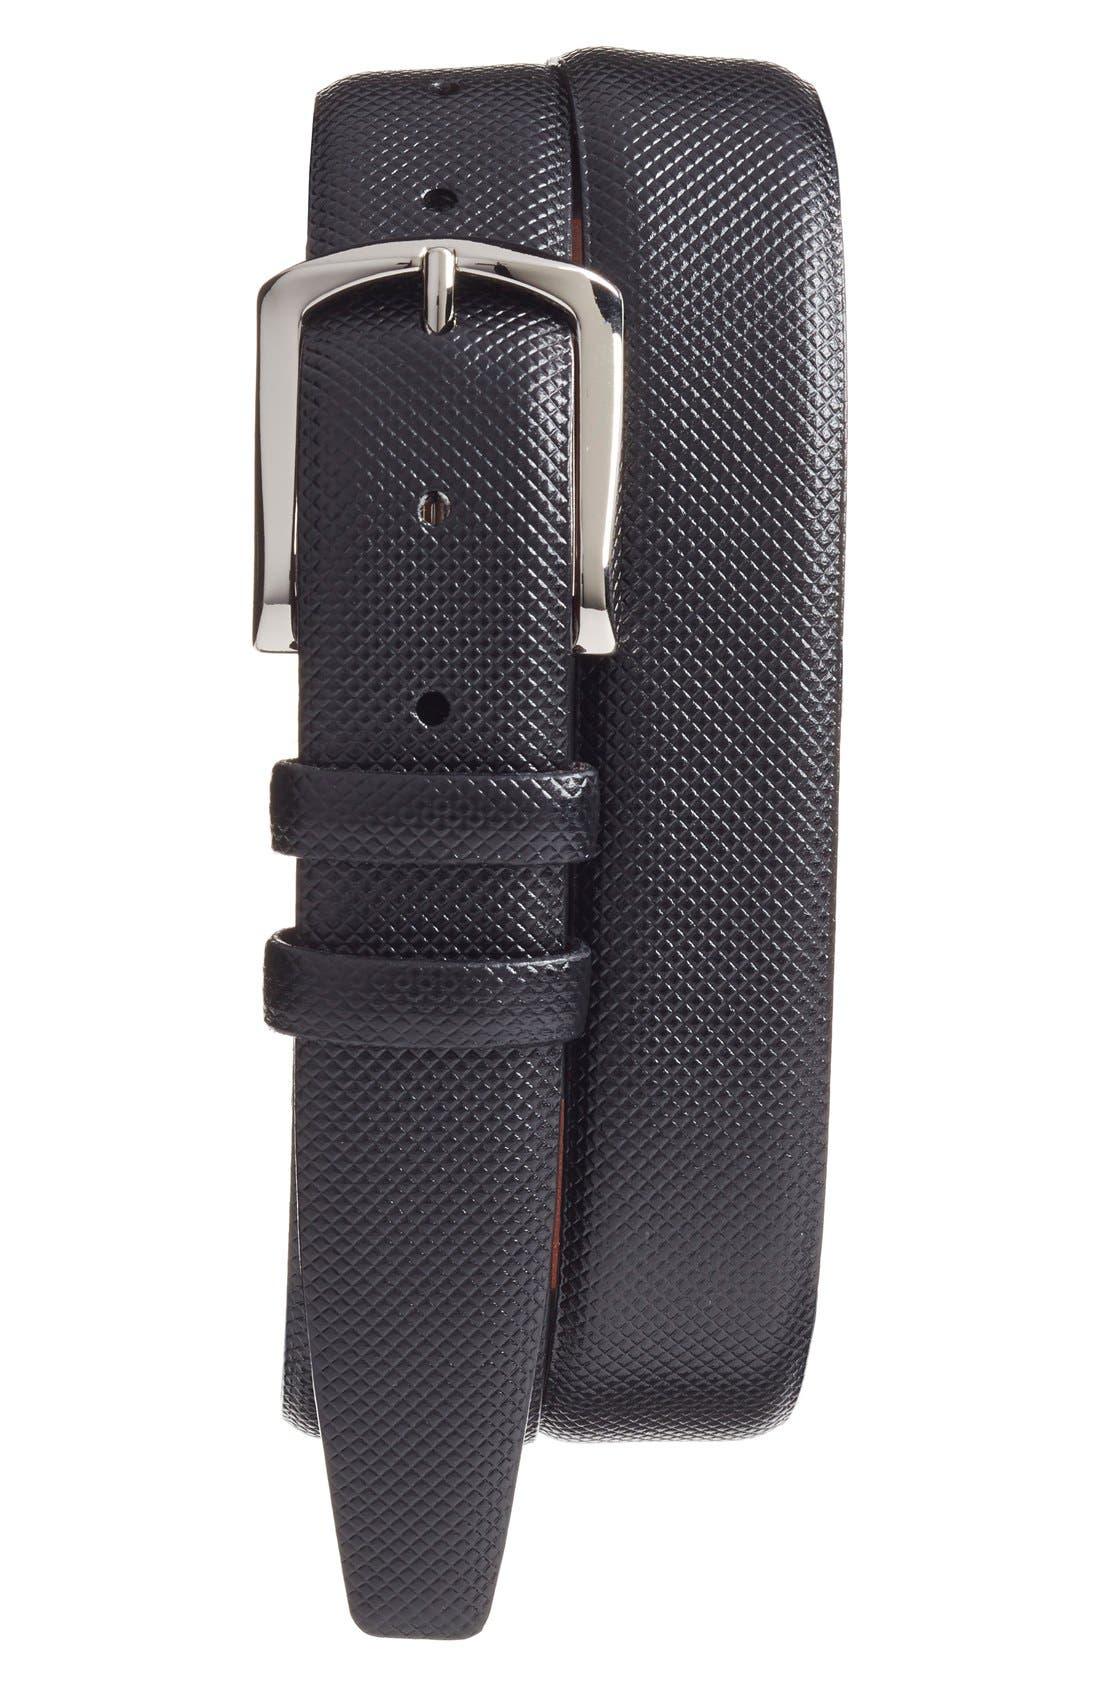 TORINO, Bulgaro Calfskin Leather Belt, Main thumbnail 1, color, BLACK